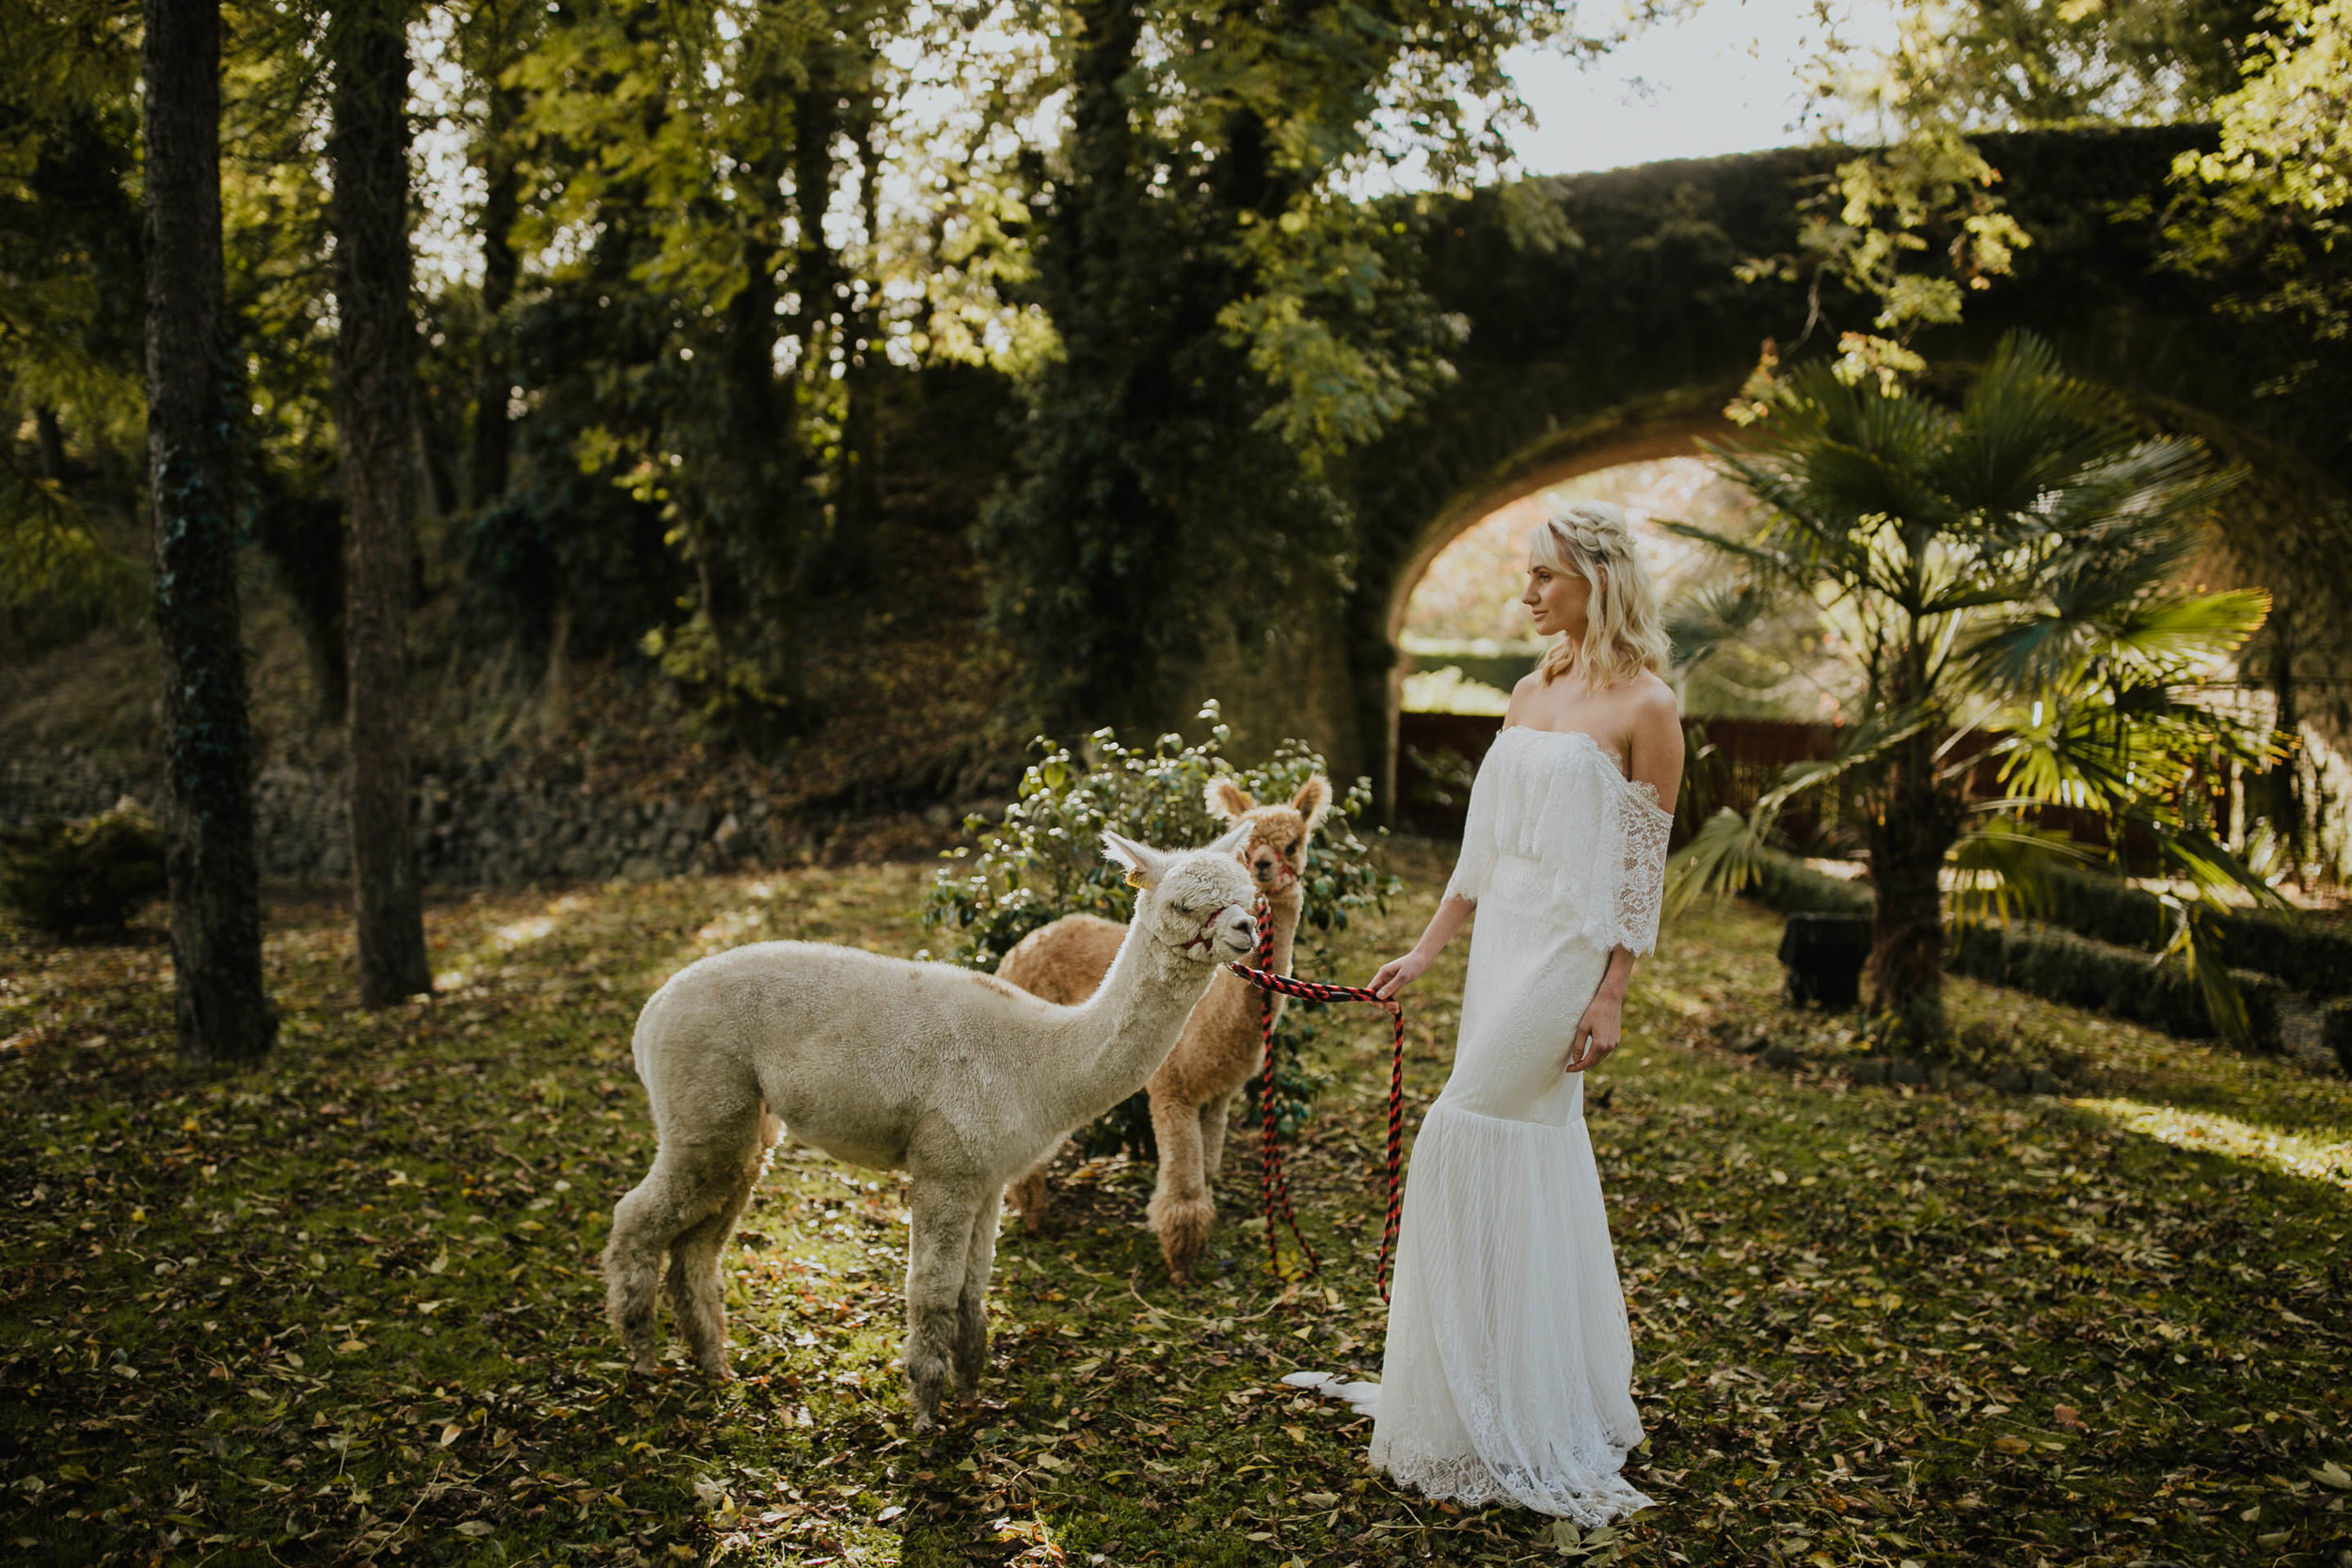 boho_wedding_alpaca_xpose_station_house_livia_figueiredo_photography_06.jpg